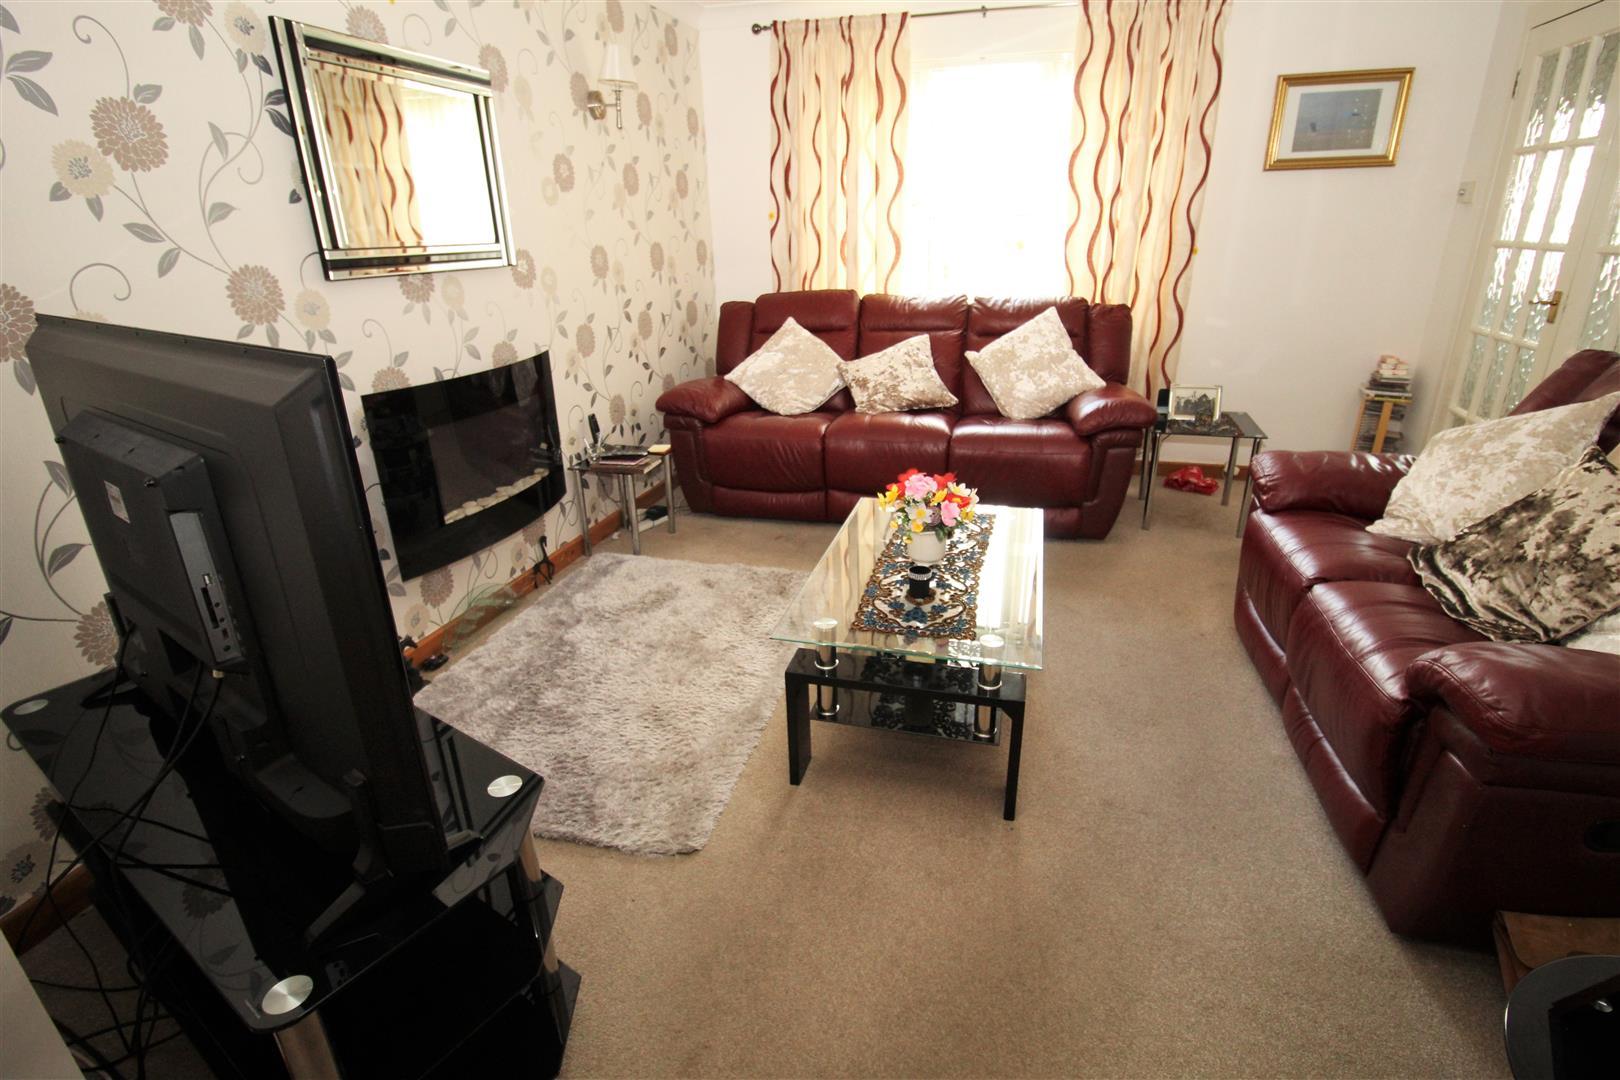 3 Bedrooms, House - Semi-Detached, Corwen Drive, Netherton, Merseyside